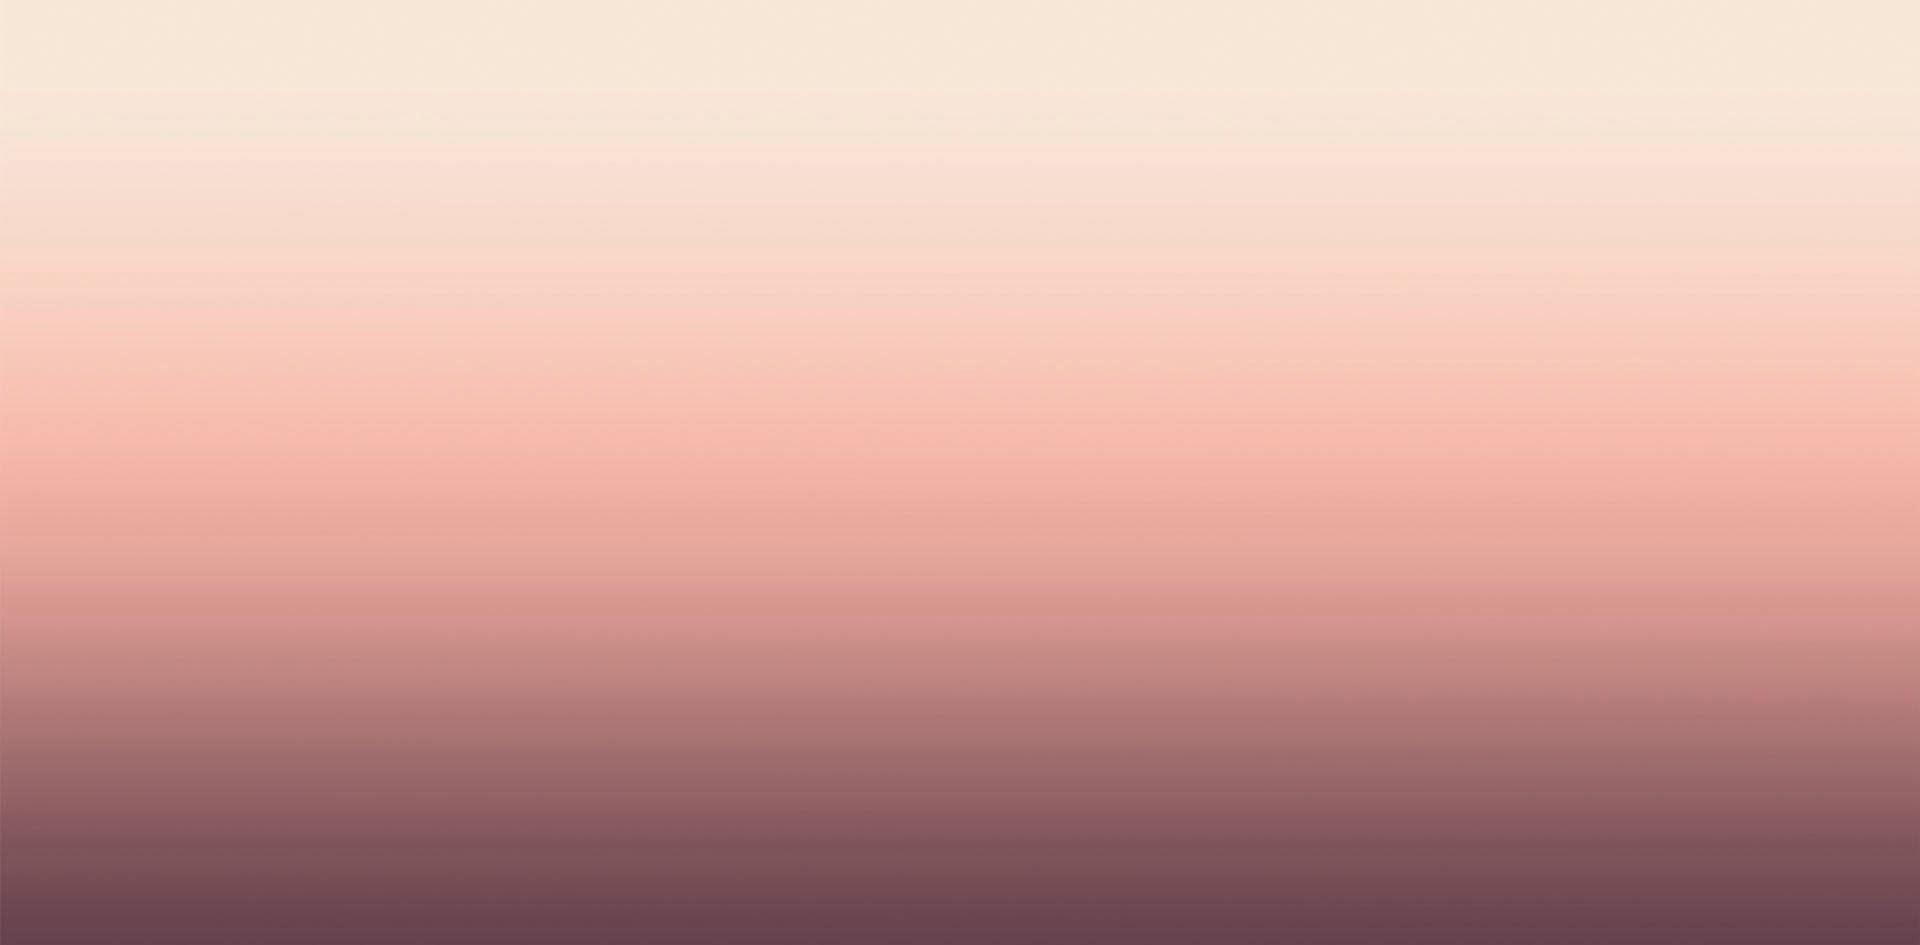 Fototapete Sunset - Ombre Wohnen/Accessoires & Leuchten/Wohnaccessoires/Tapeten und Bordüren/Fototapeten/Fototapeten Strand